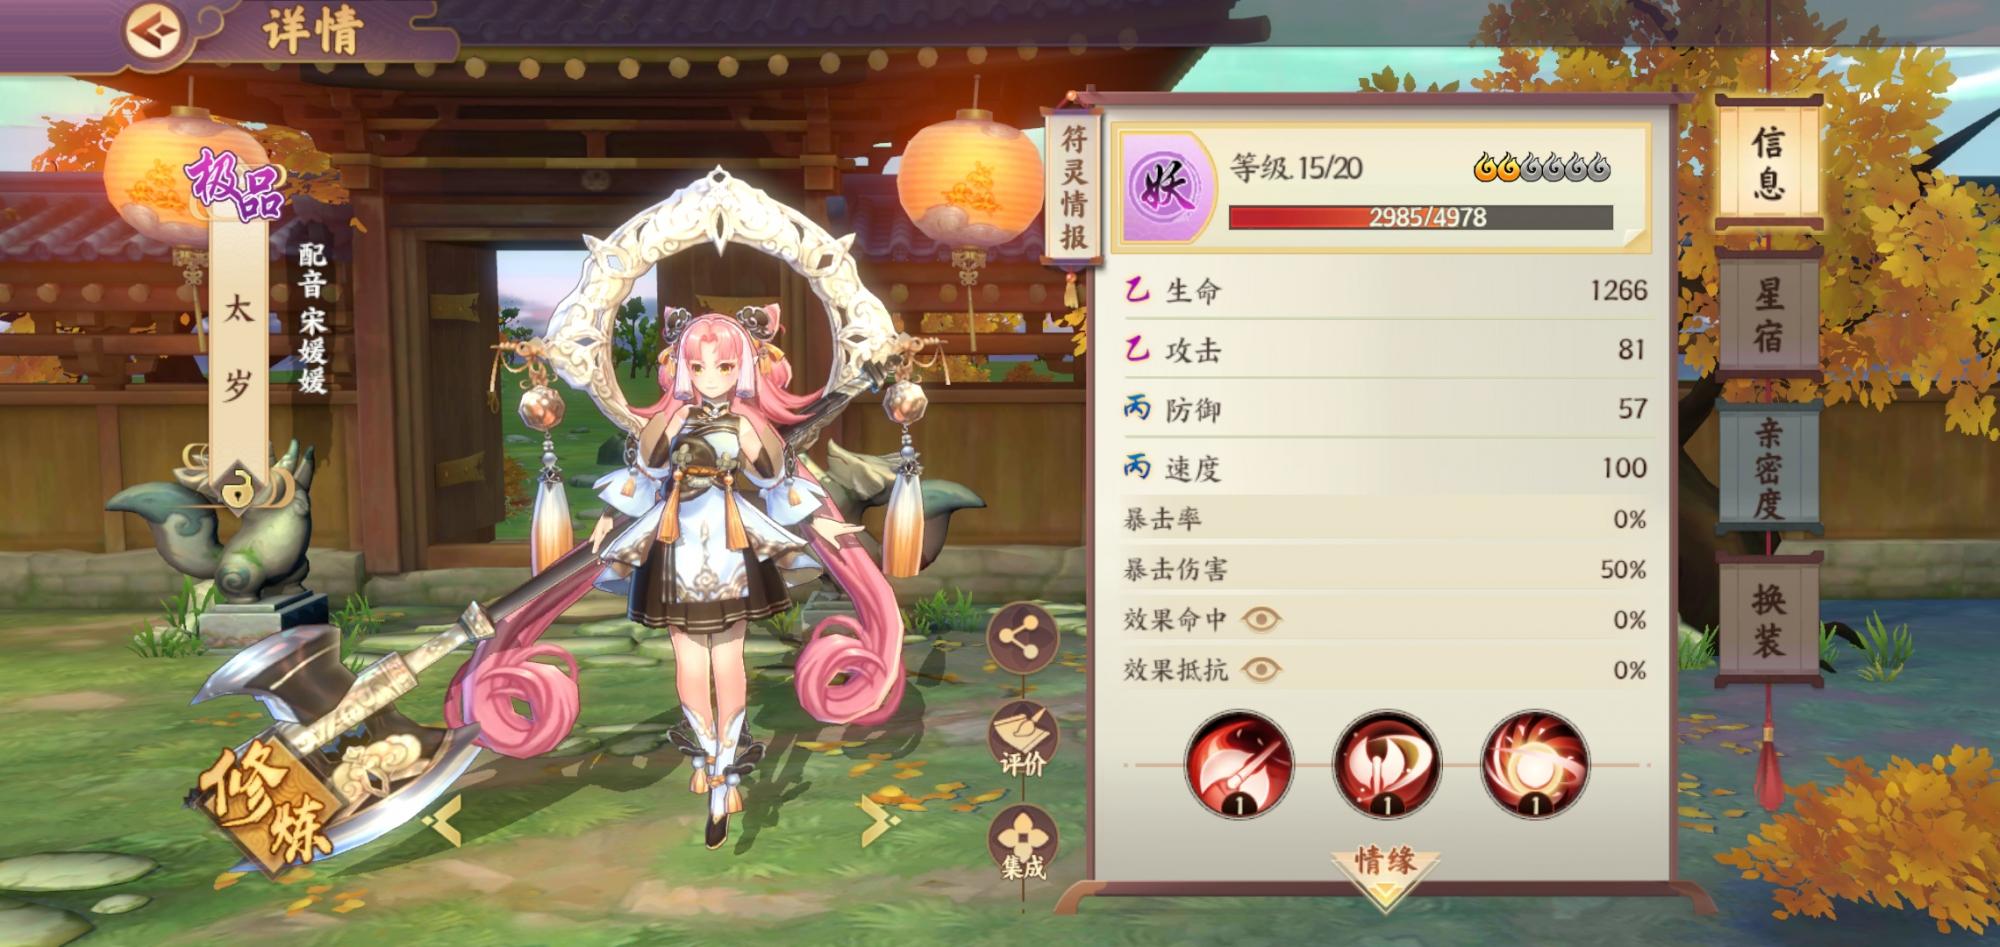 Screenshot_20190528_215316_com.tencent.yunmeng.jpg